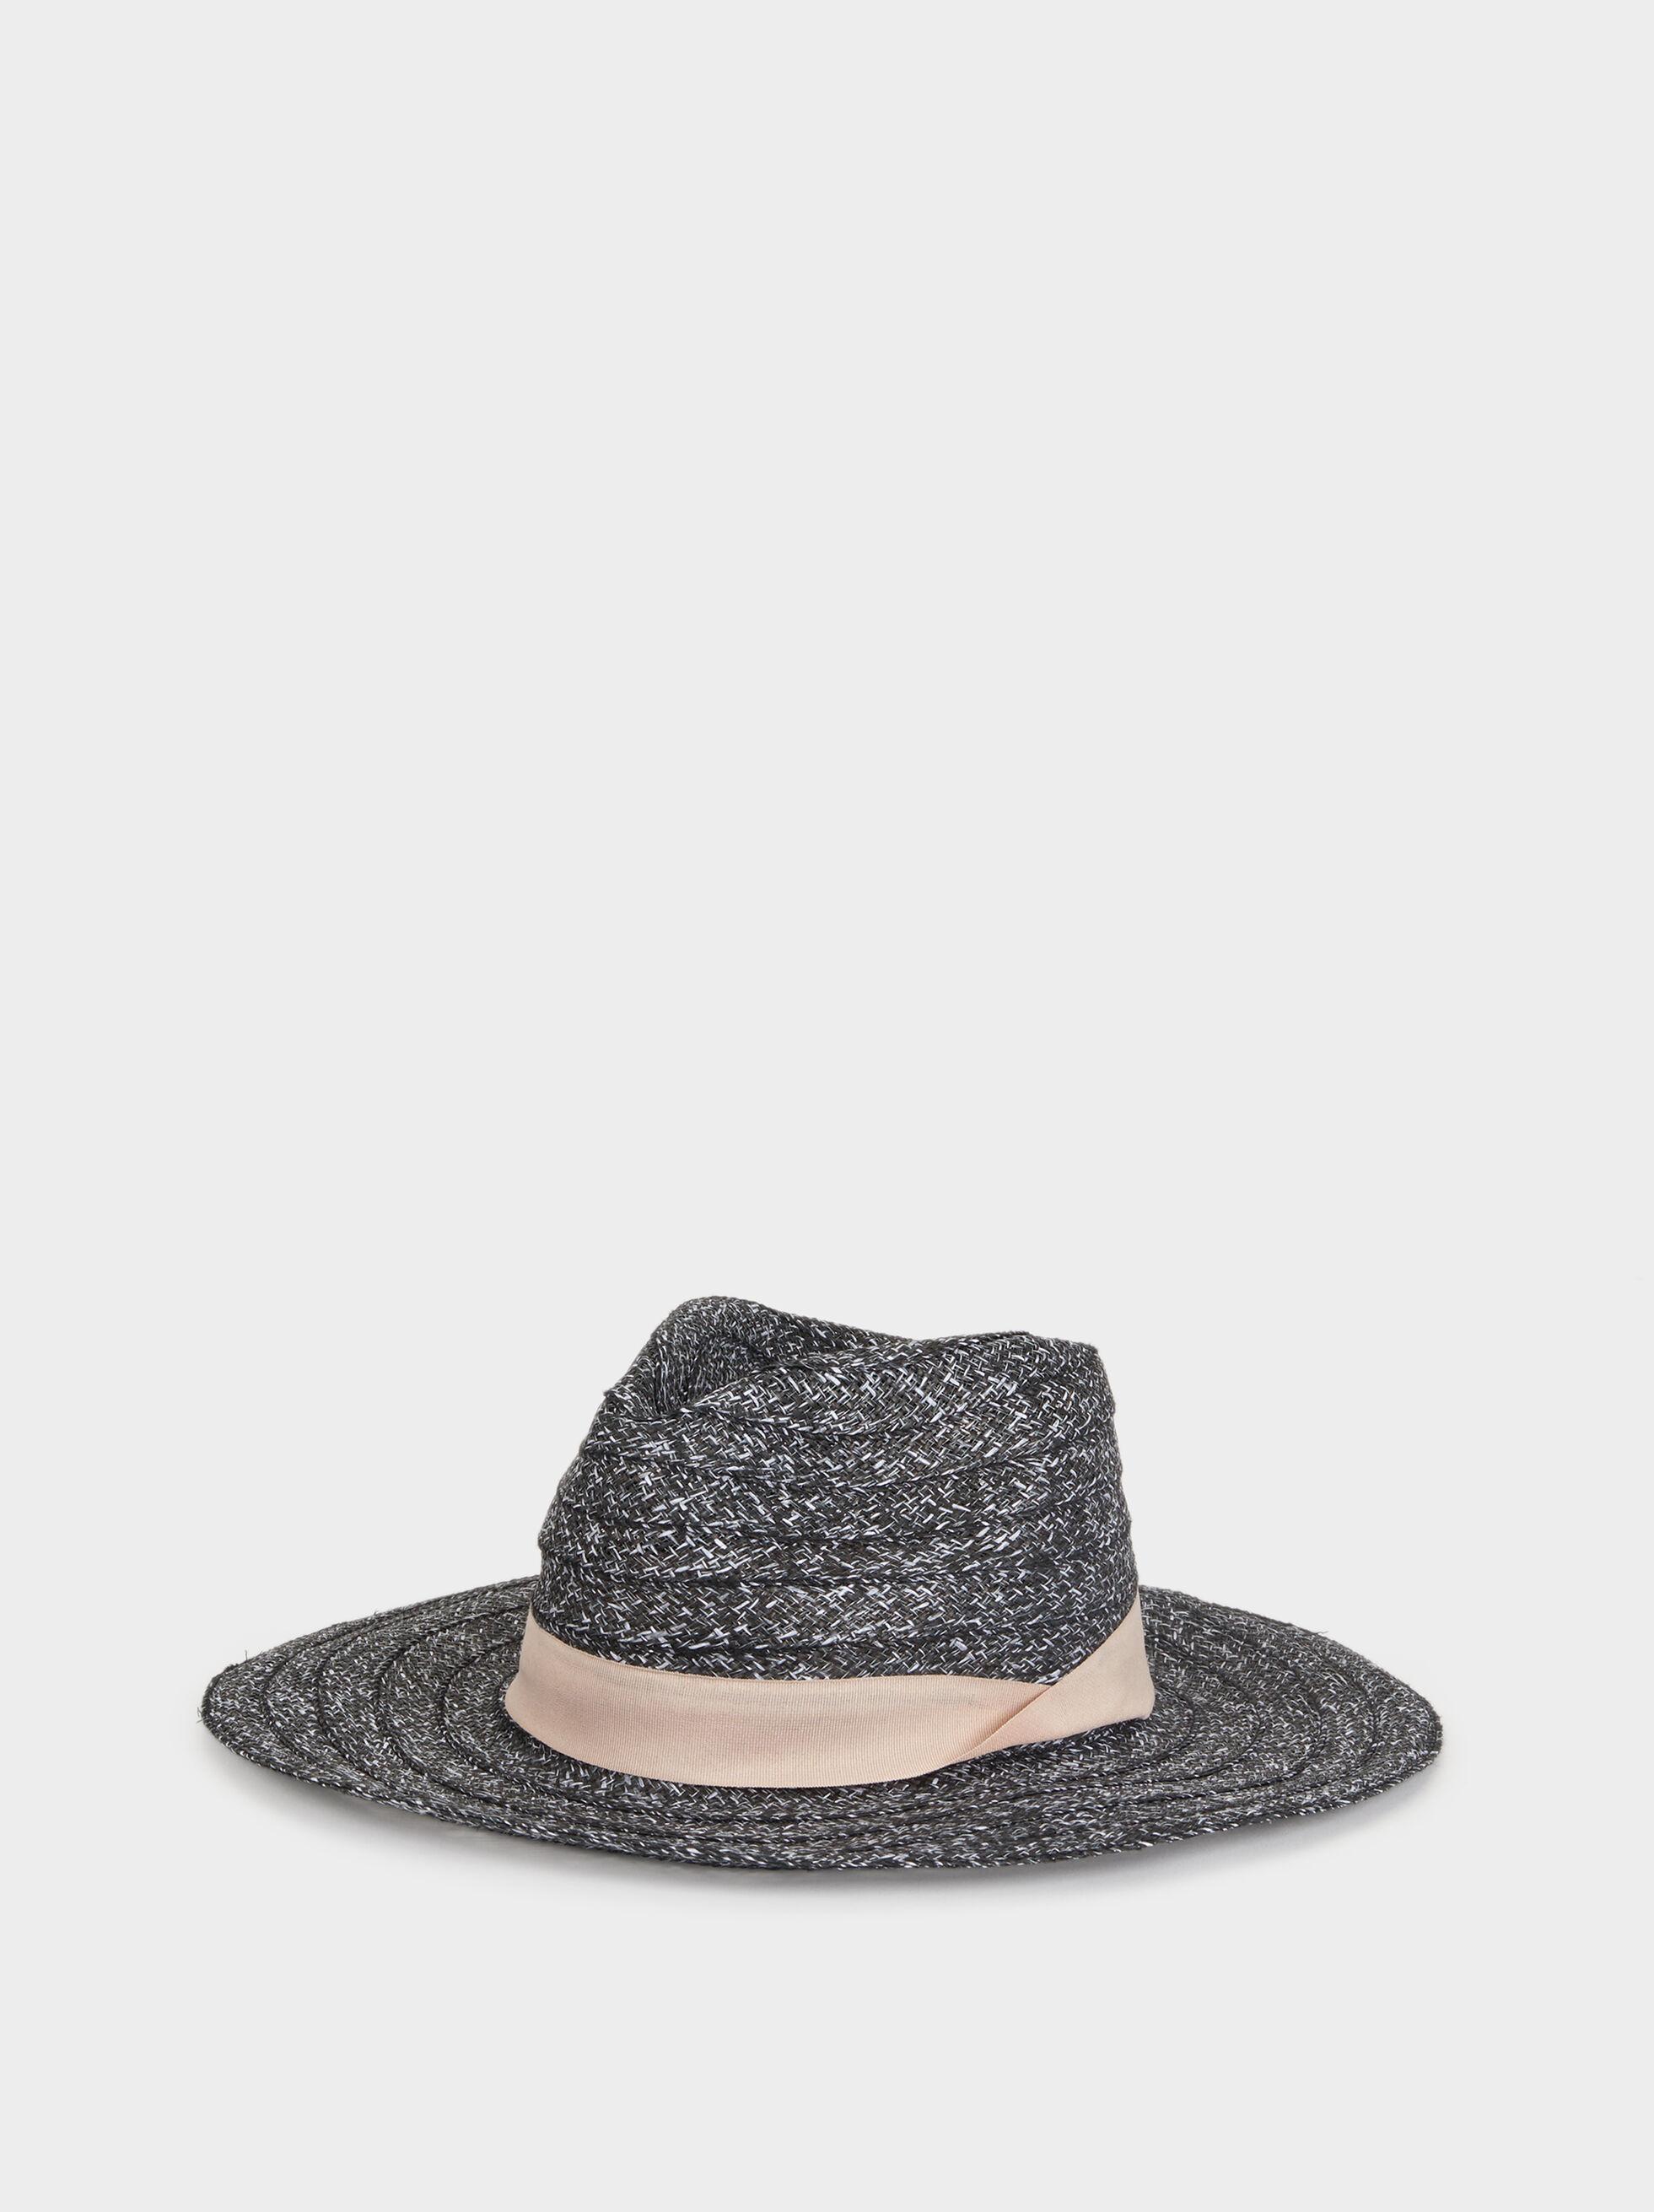 Faux Raffia Hat, Black, hi-res